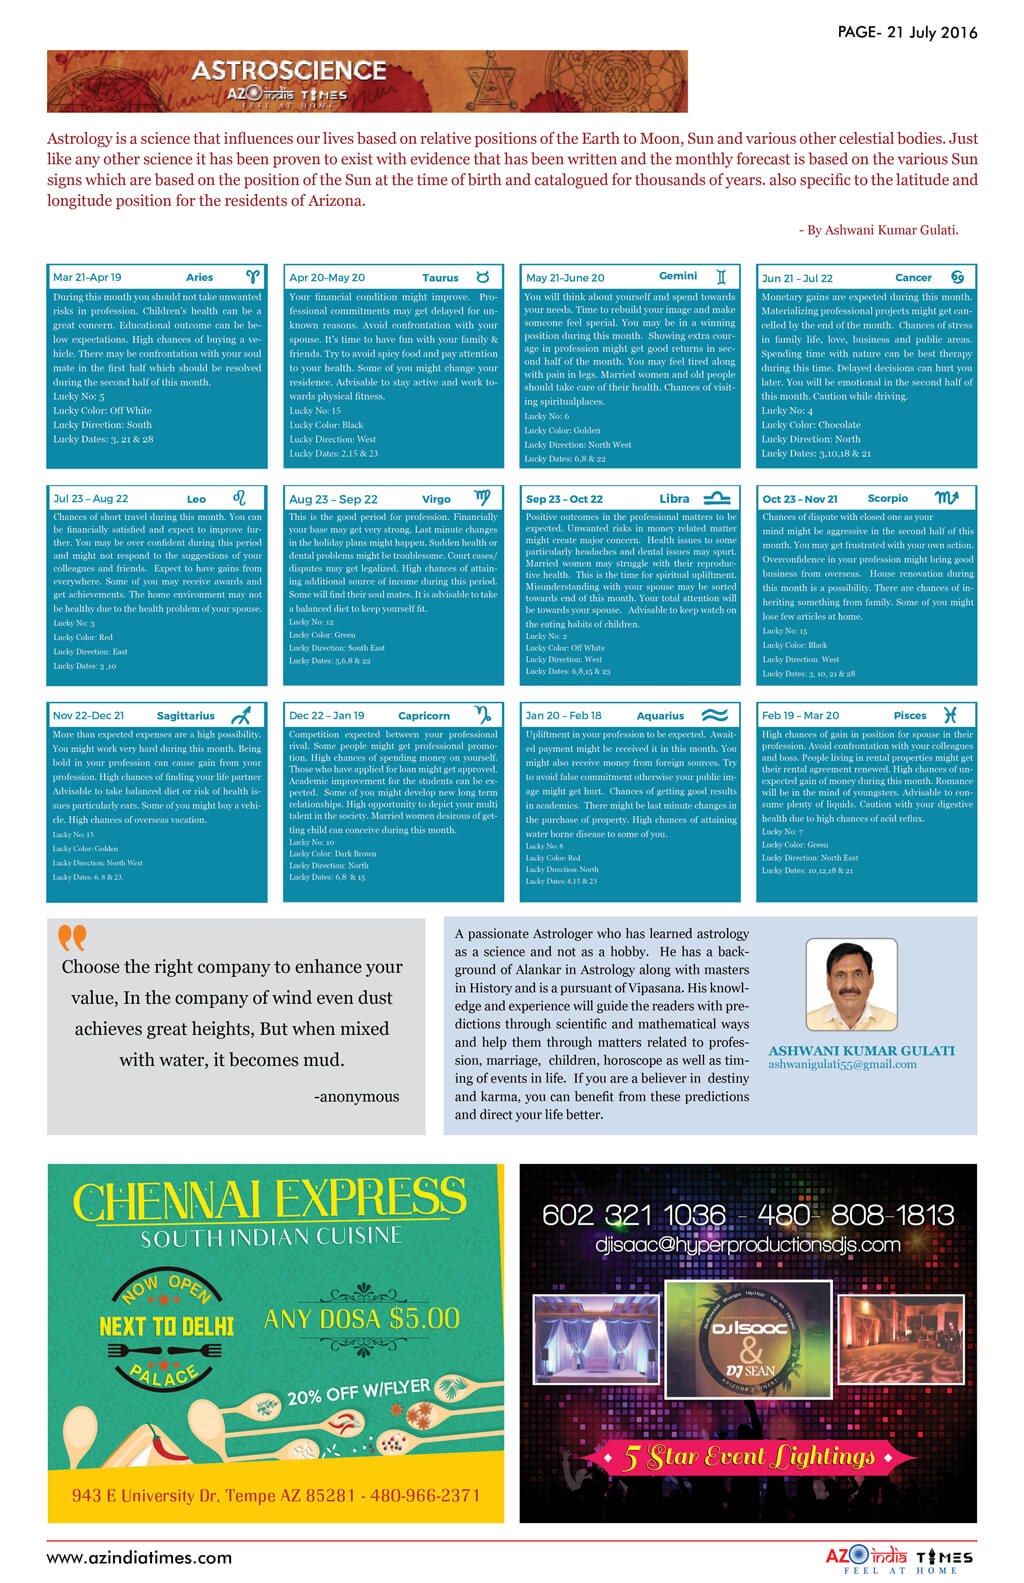 AZ INDIA NEWS PAGE-21